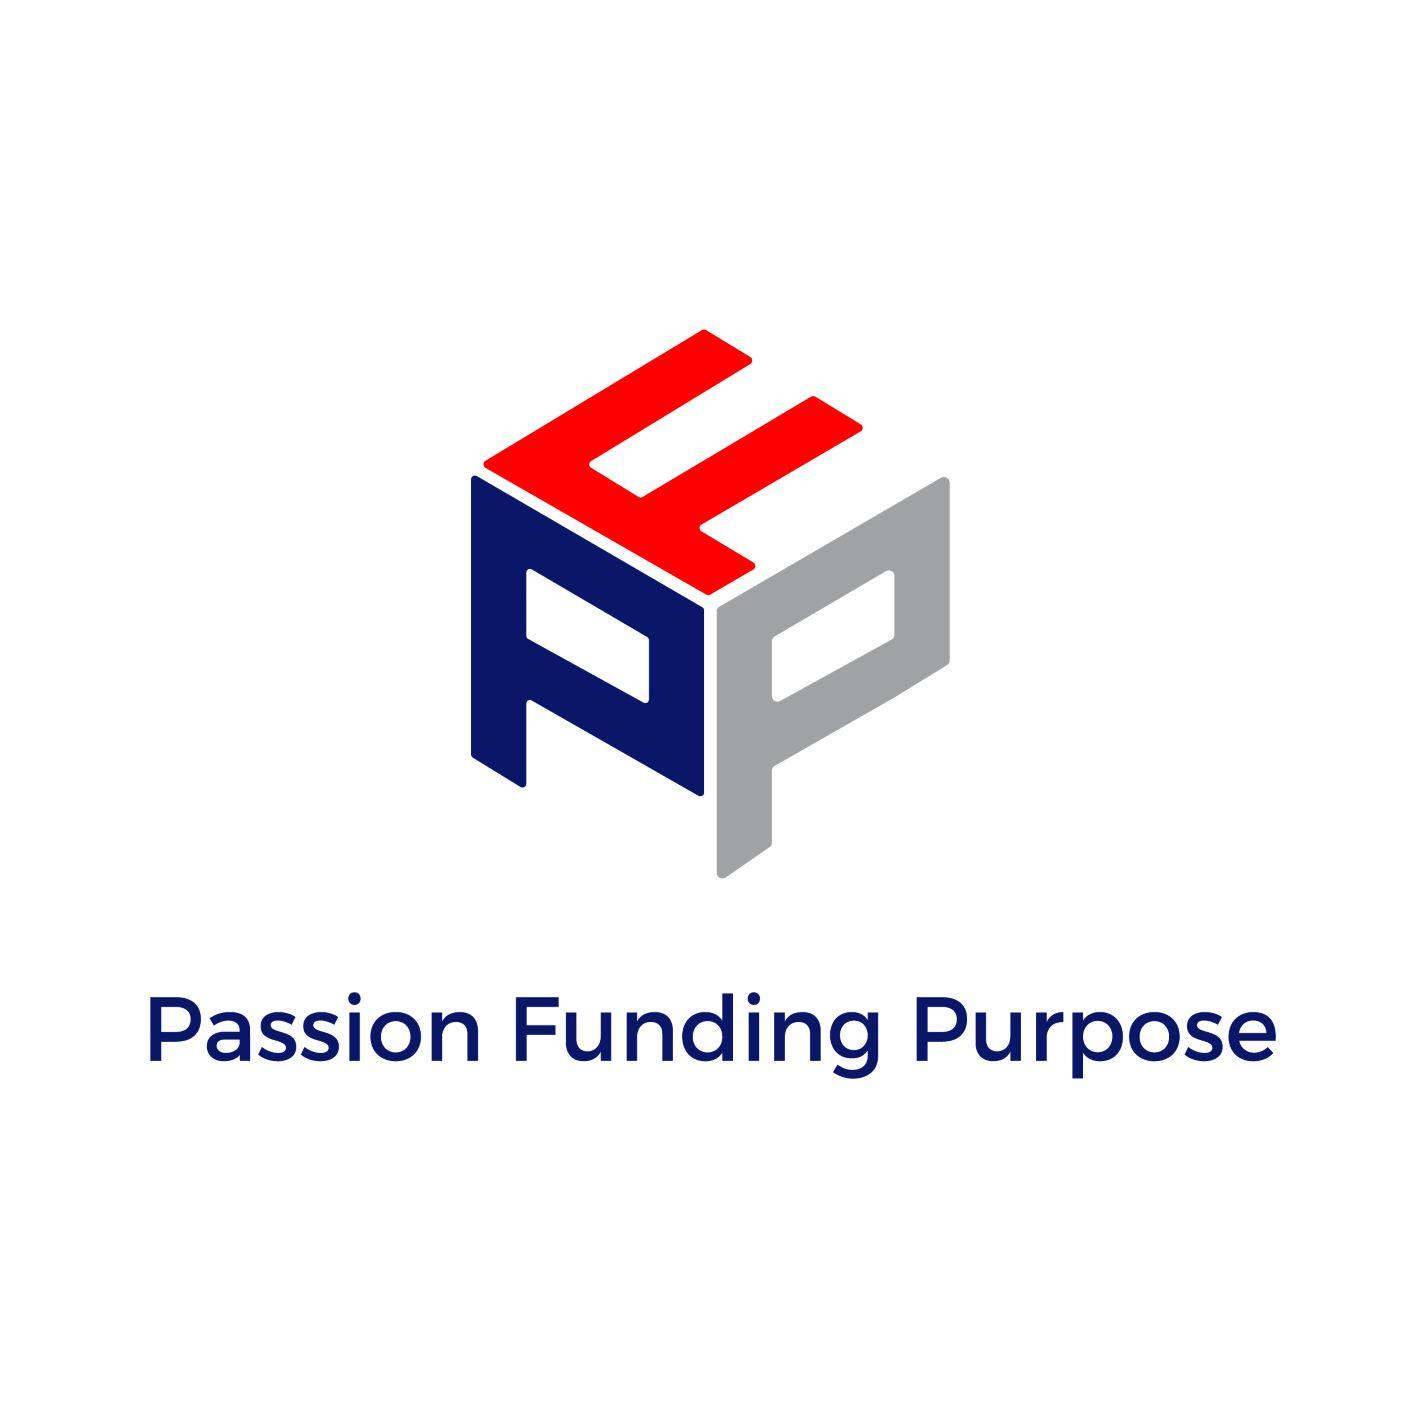 Passion Funding Purpose